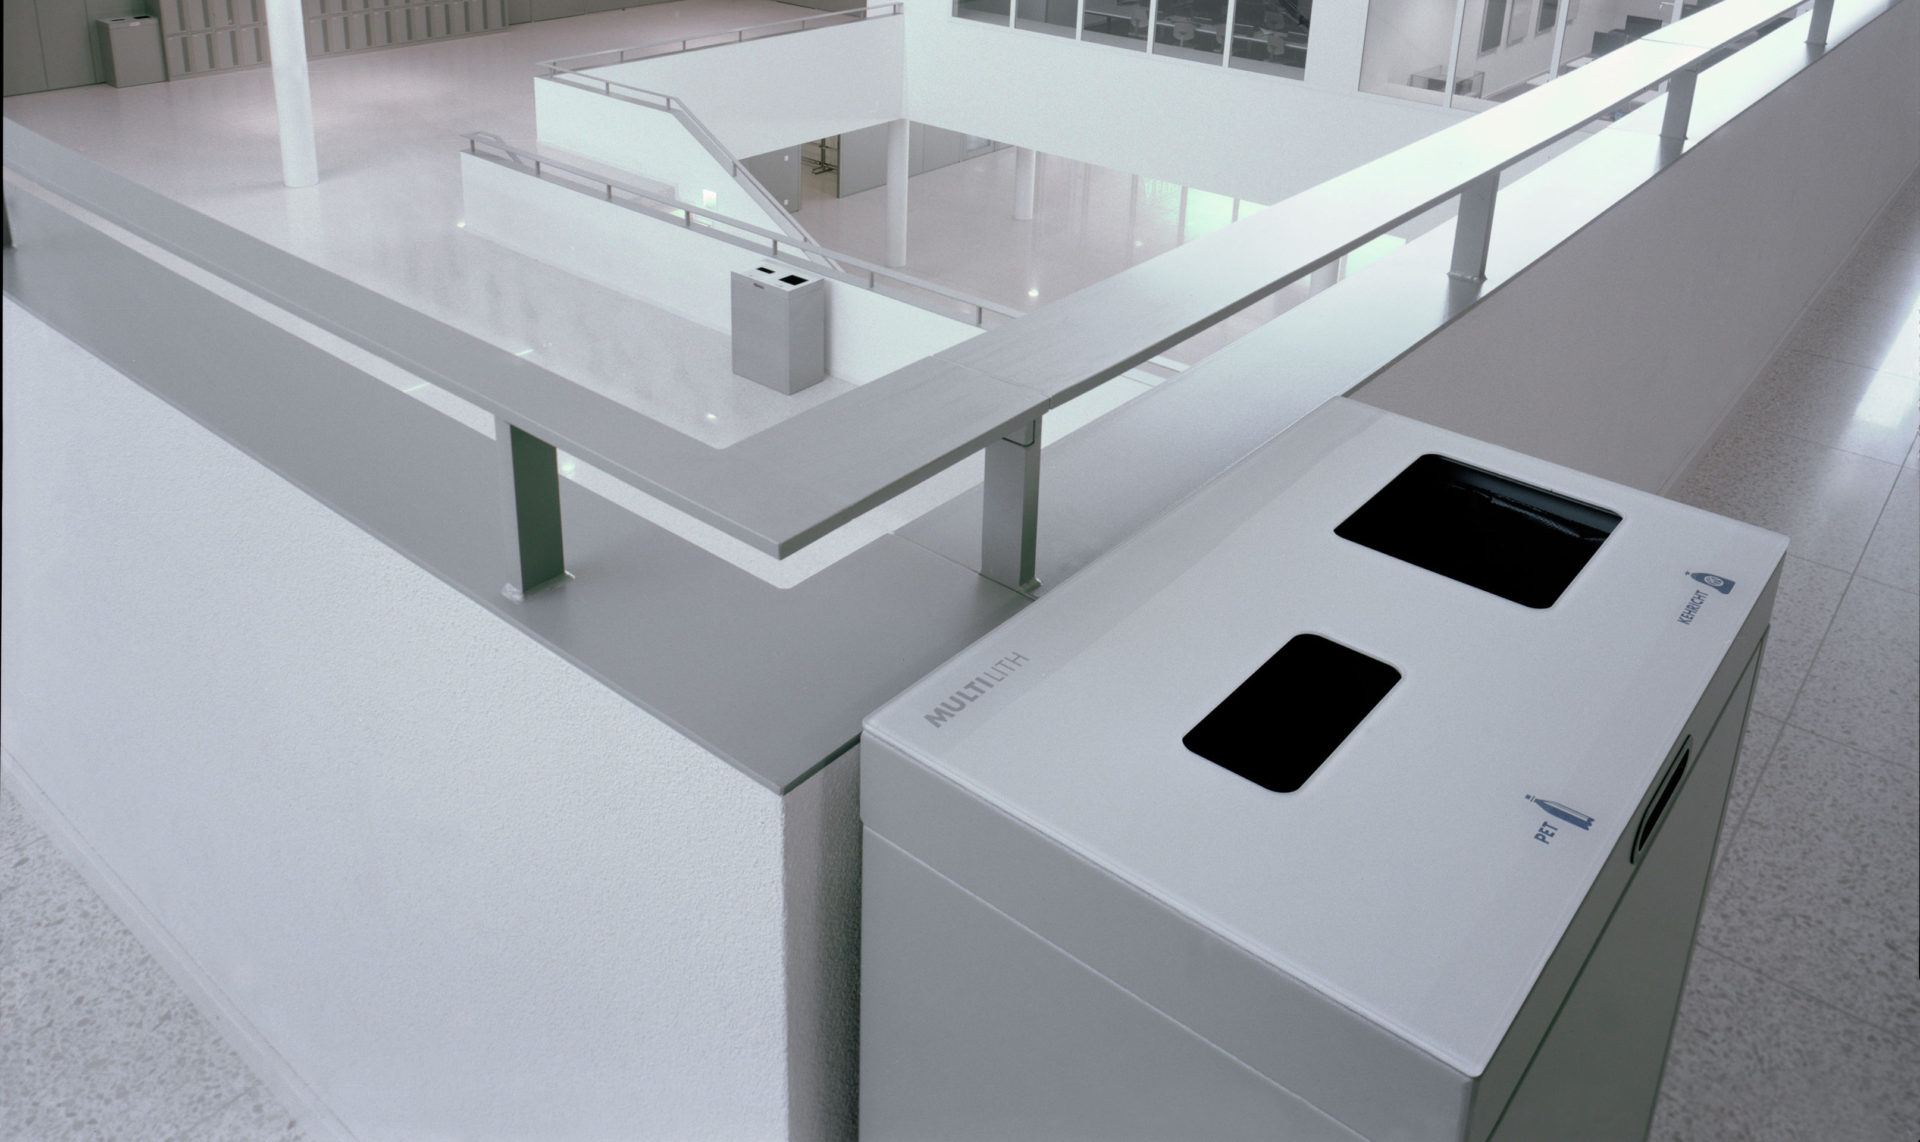 Recyclingstation Oberstuffen Schulhaus Horw Luzern, Multilith 2.0, PET Recycling, Abfalltrennung, Abfall Mobiliar